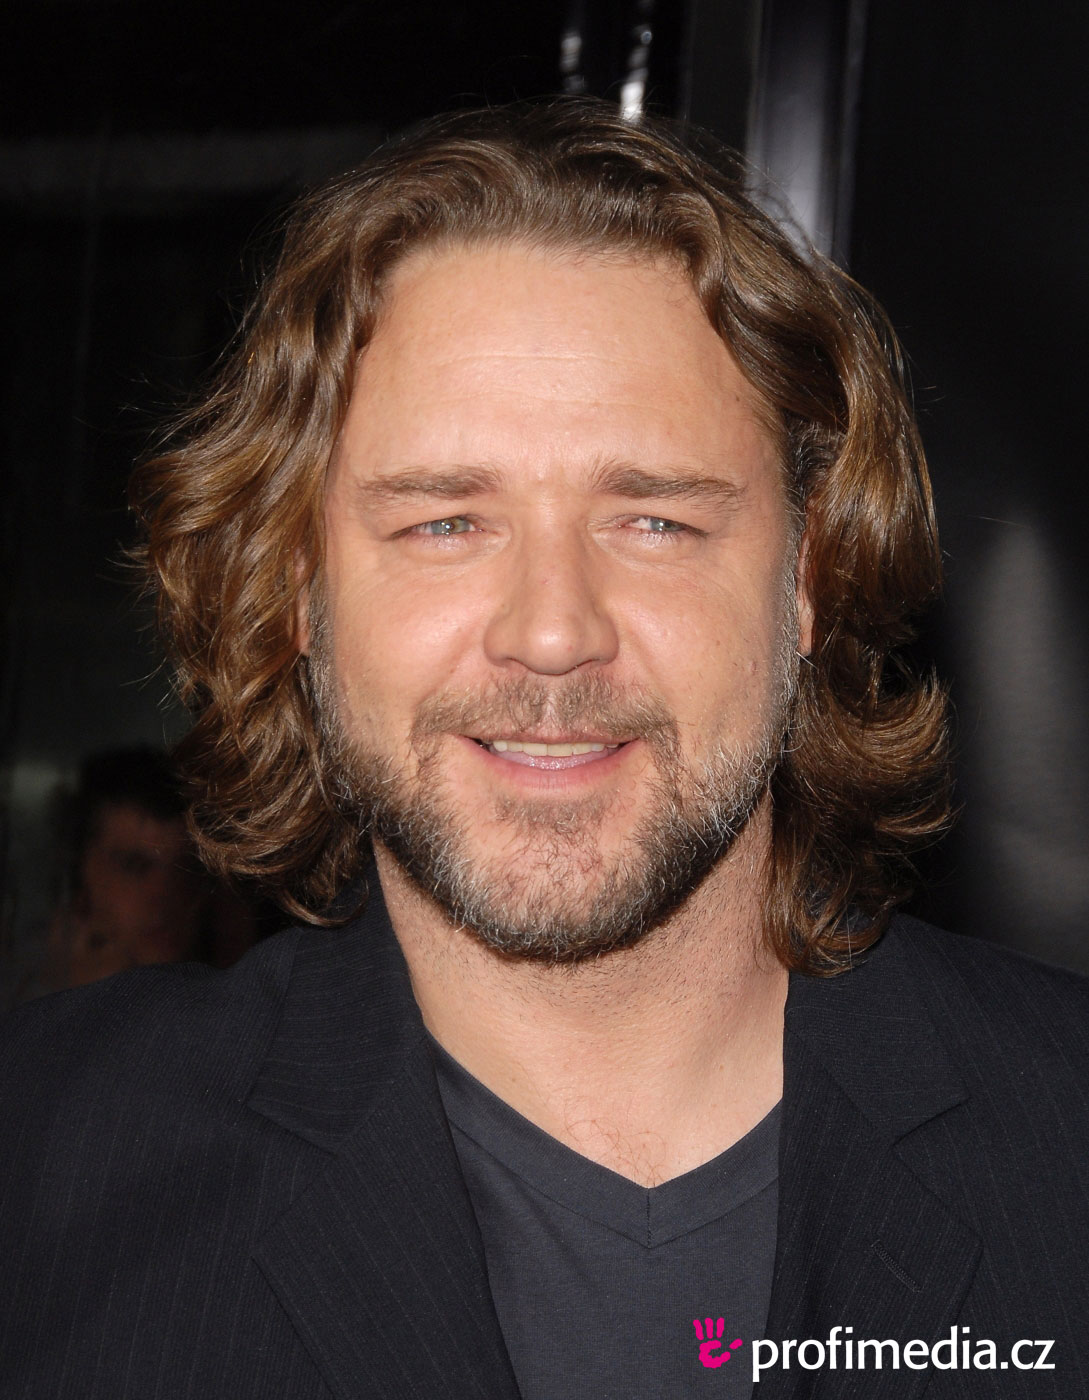 Russell Crowe Hairstyle Easyhairstyler